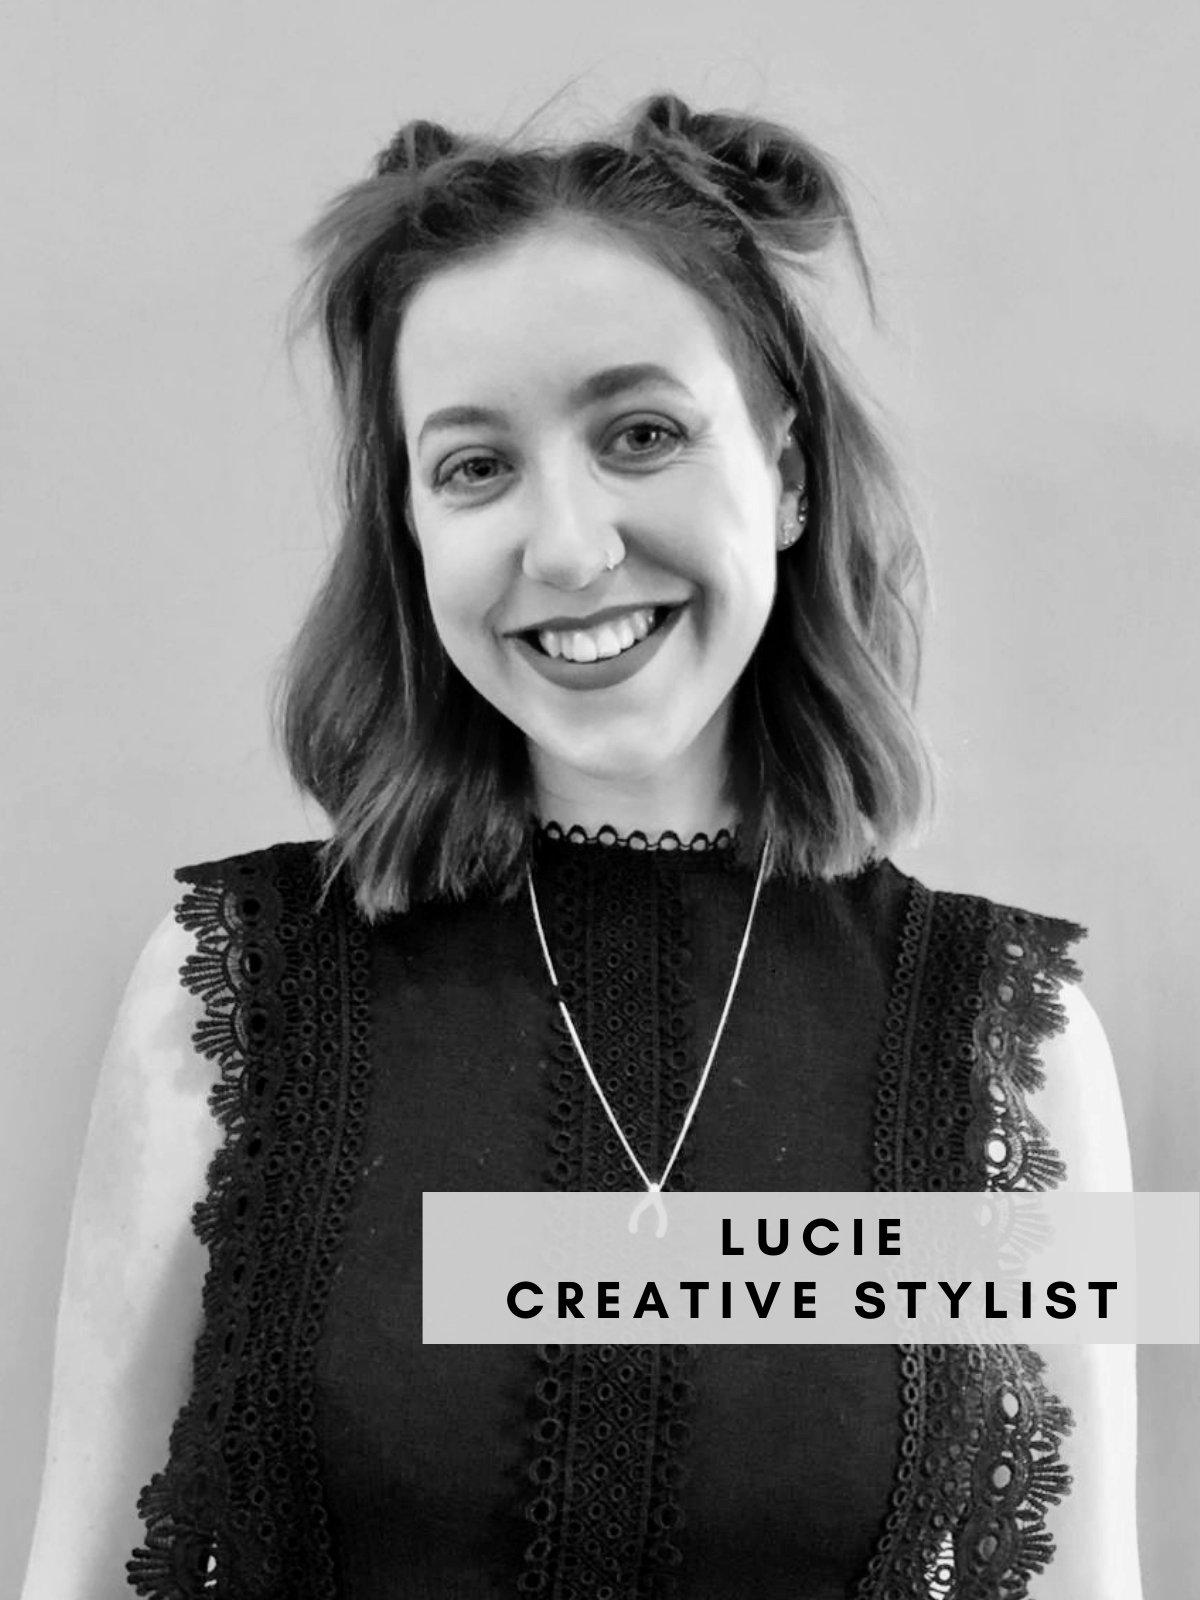 Lucie – Creative Stylist